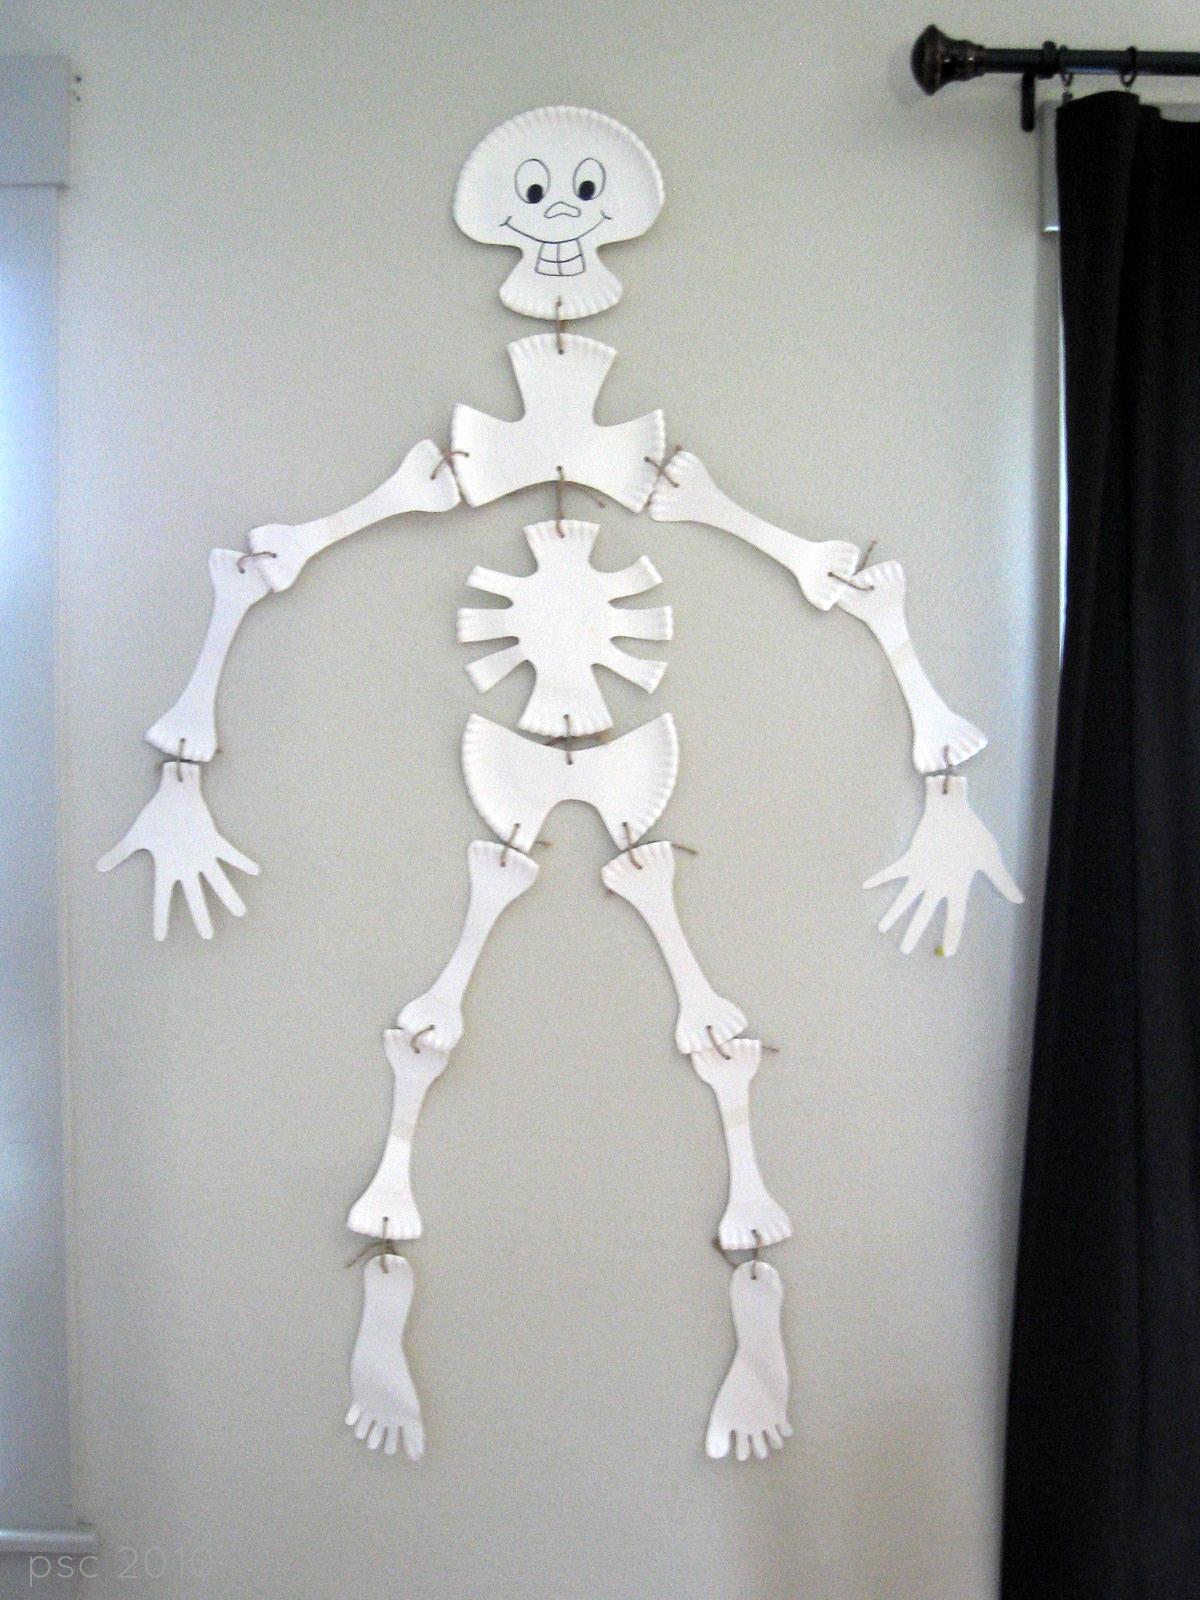 ave skeleton diagram [ 1200 x 1600 Pixel ]